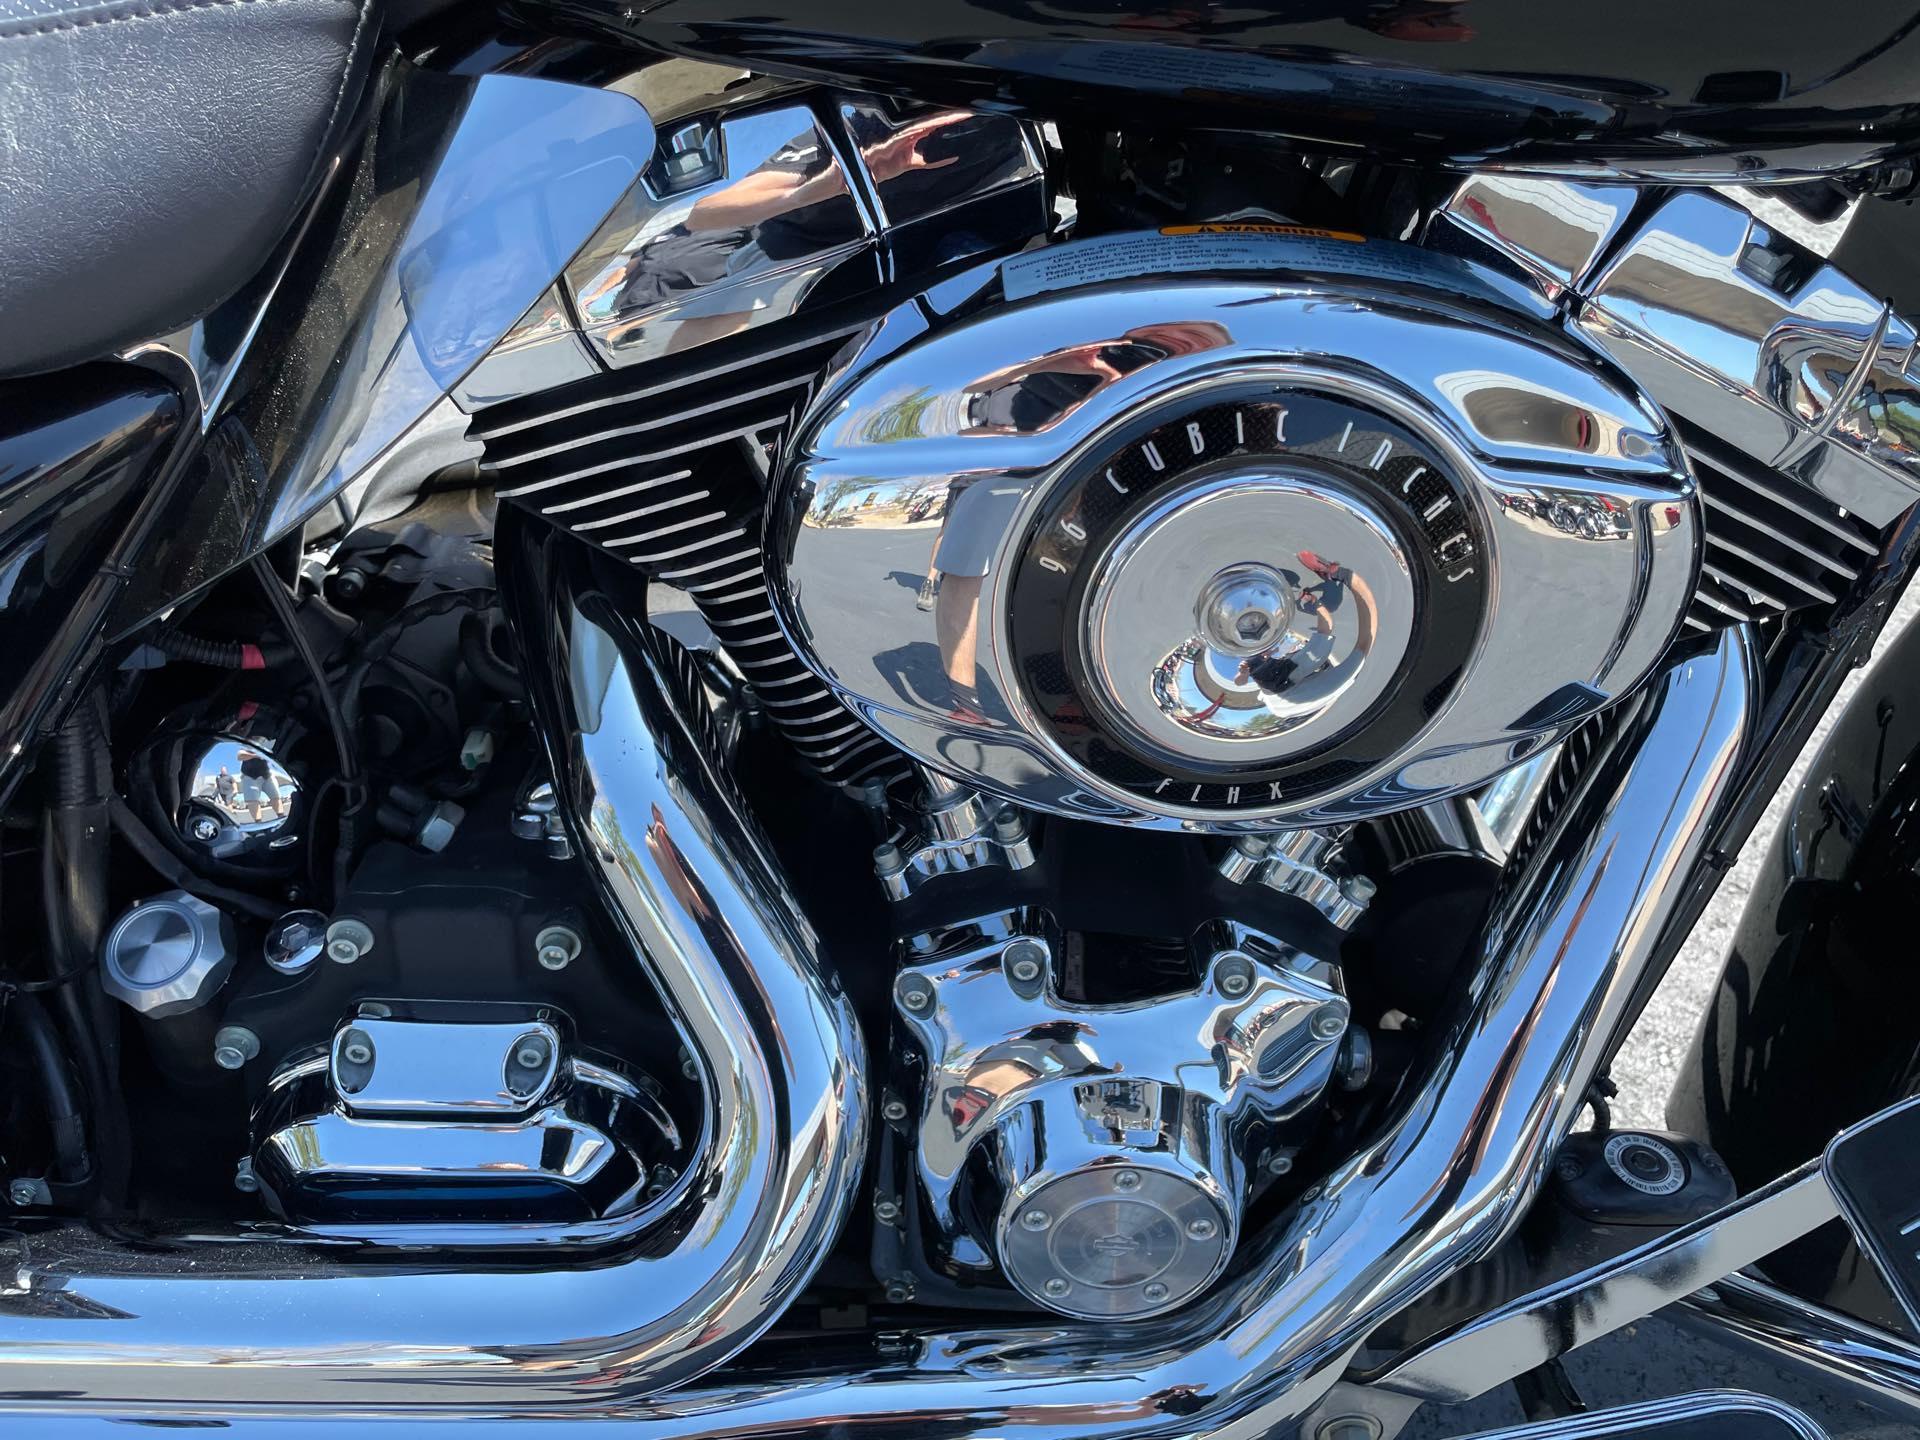 2007 Harley-Davidson Street Glide Base at Aces Motorcycles - Fort Collins